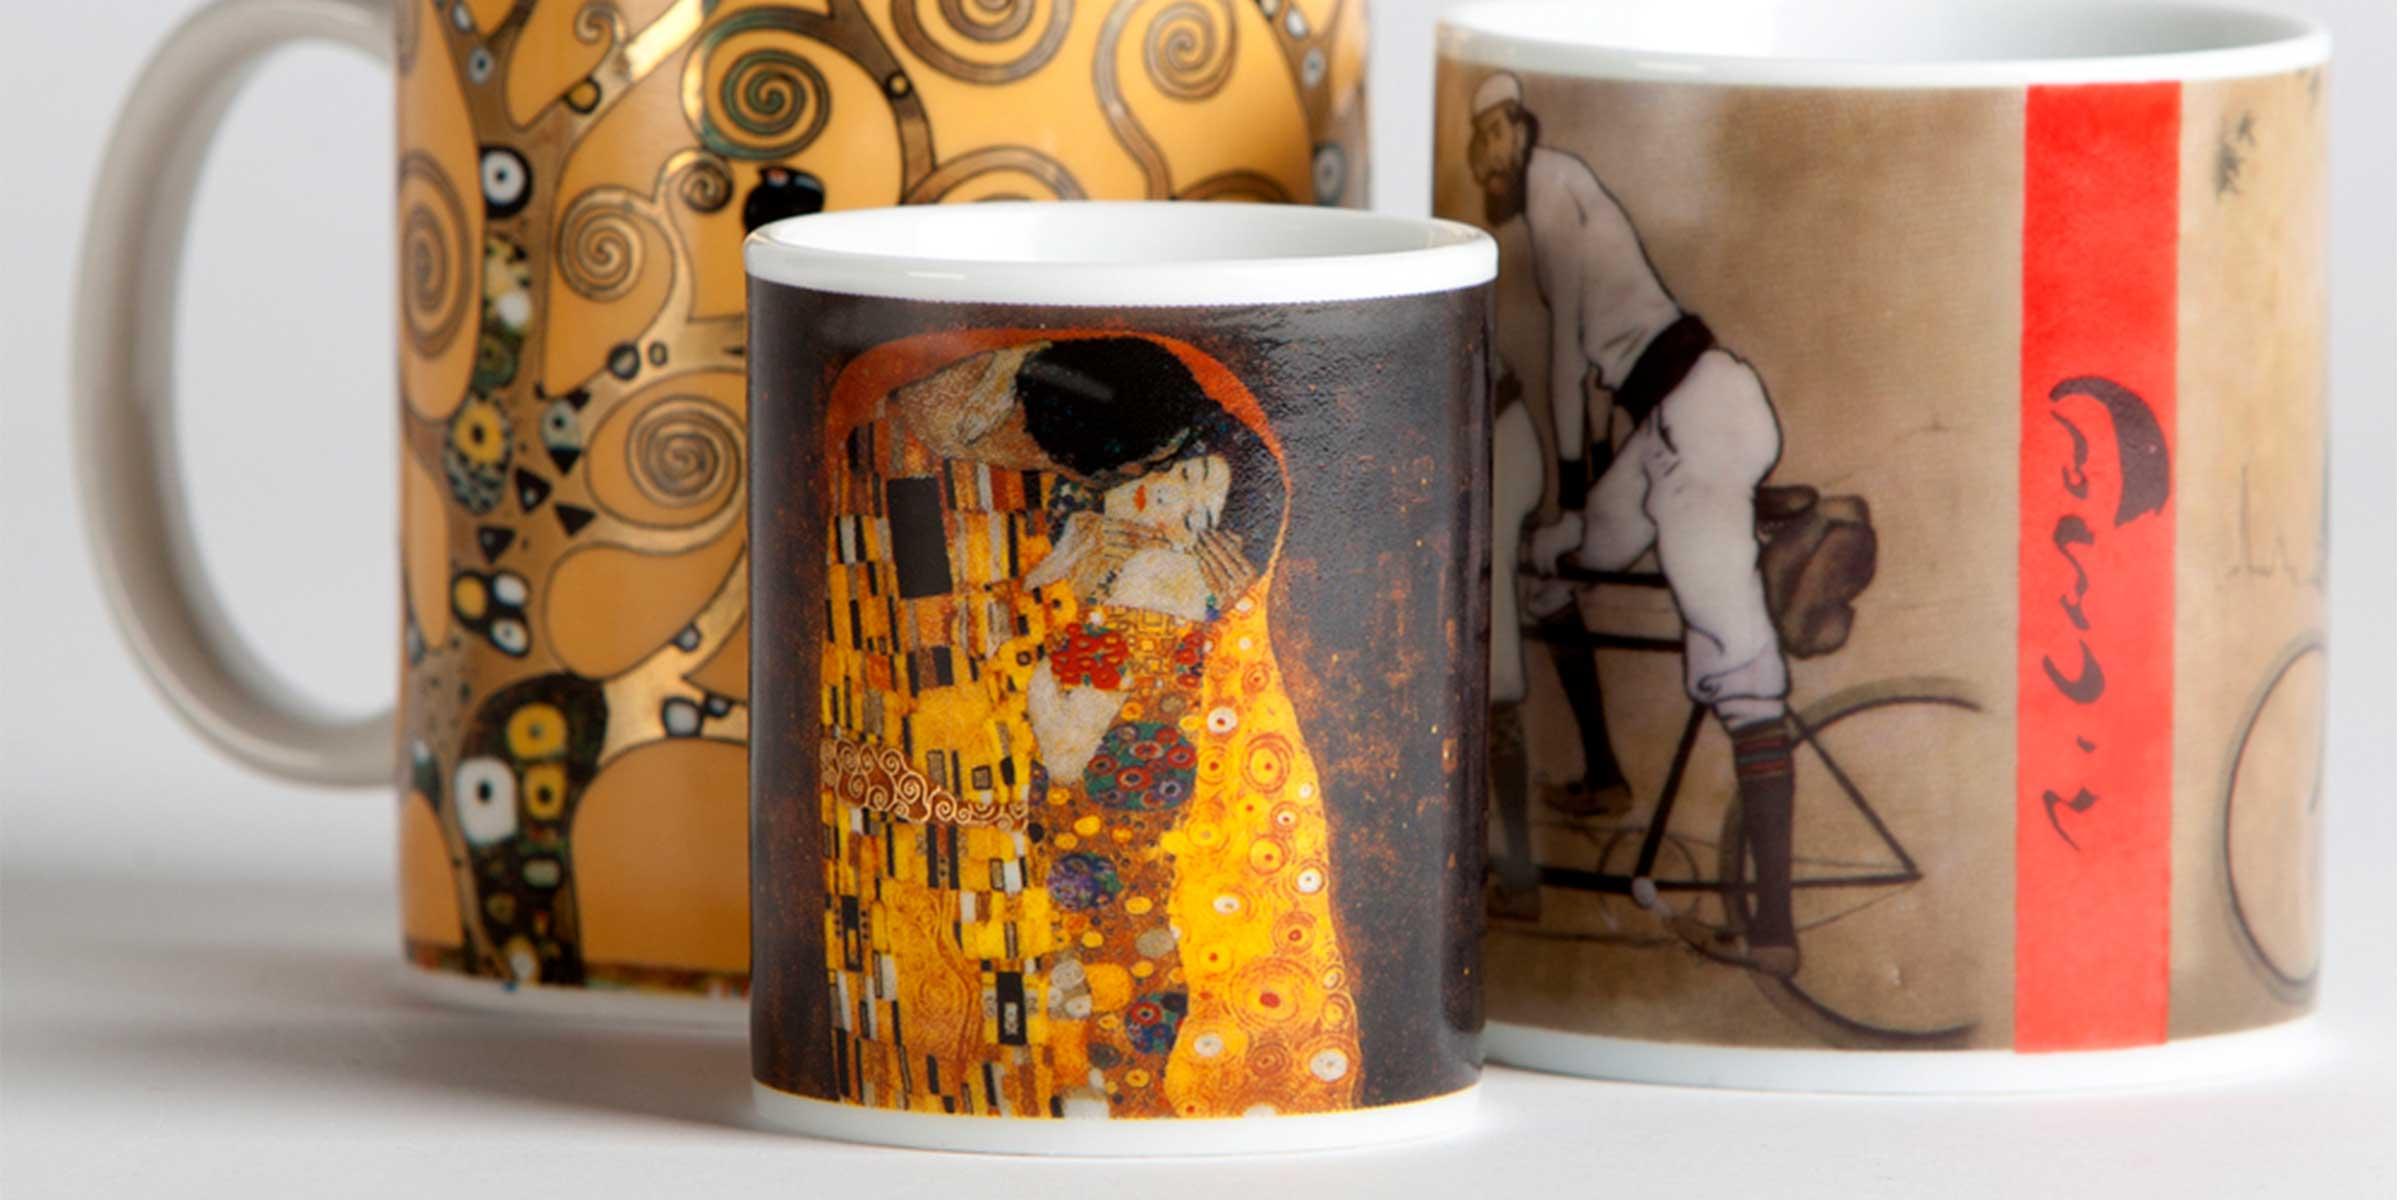 customized ceramic mugs